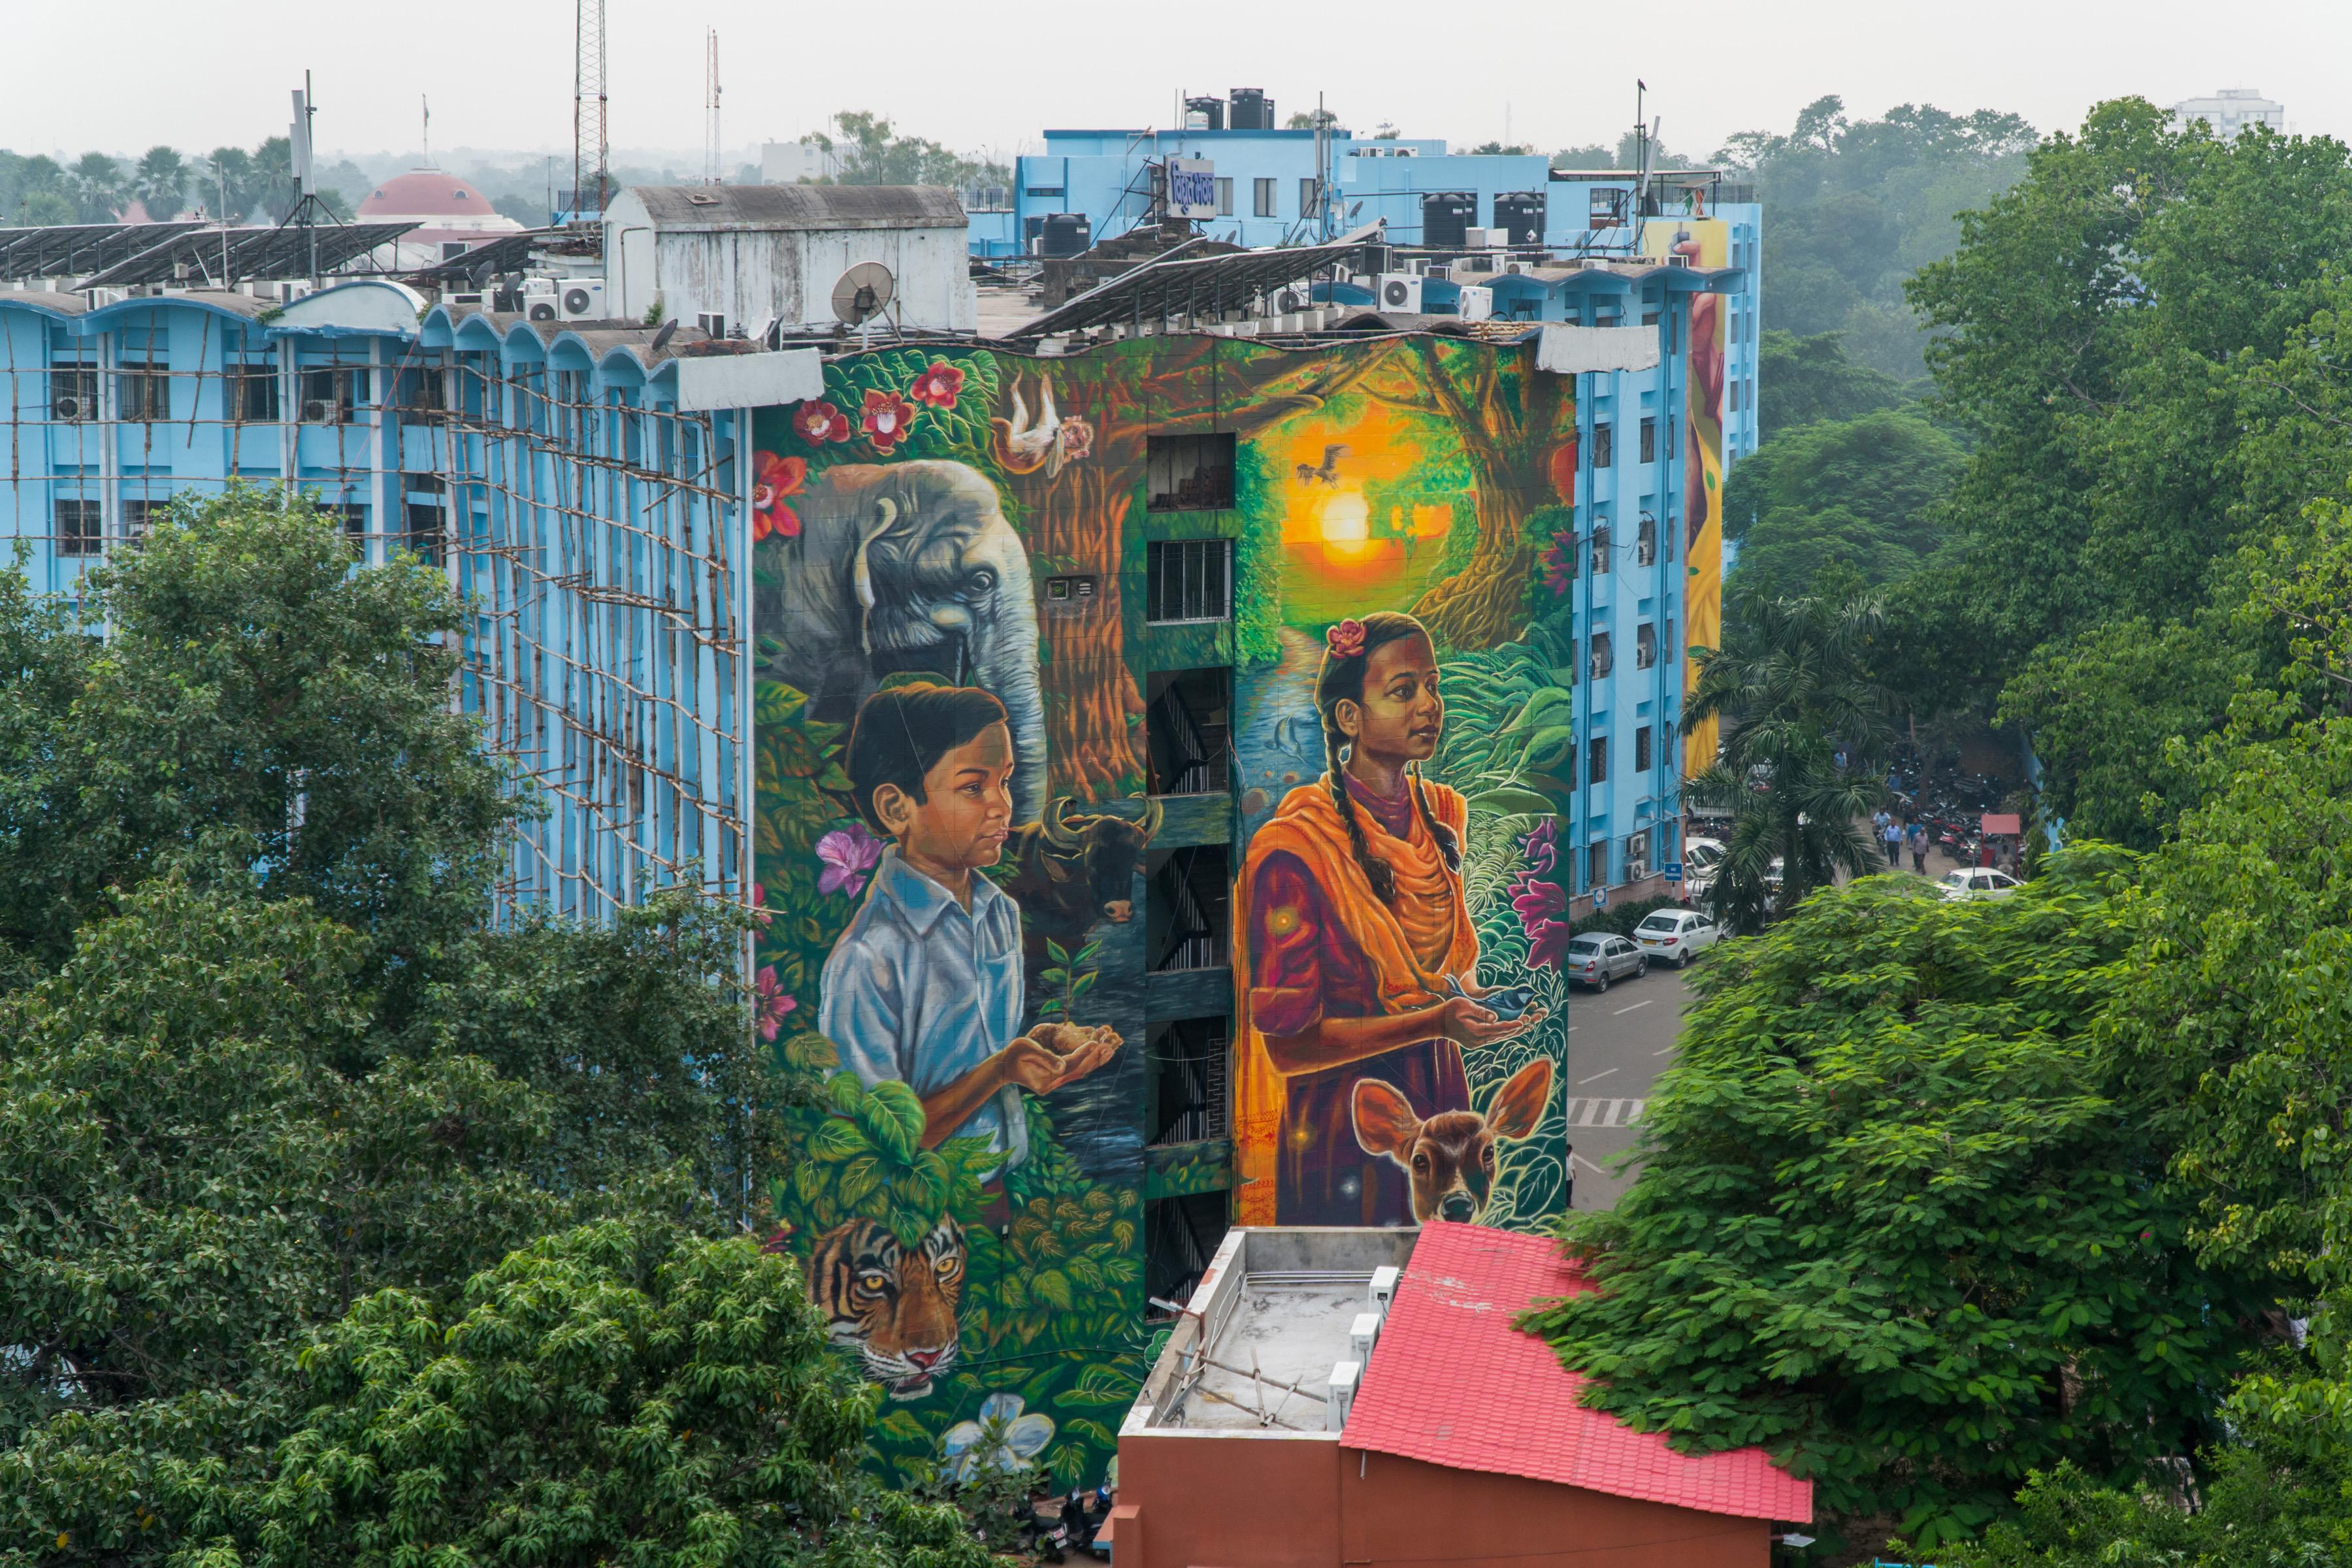 Alaniz Reveals St Art Patna 2019 Rohan 2